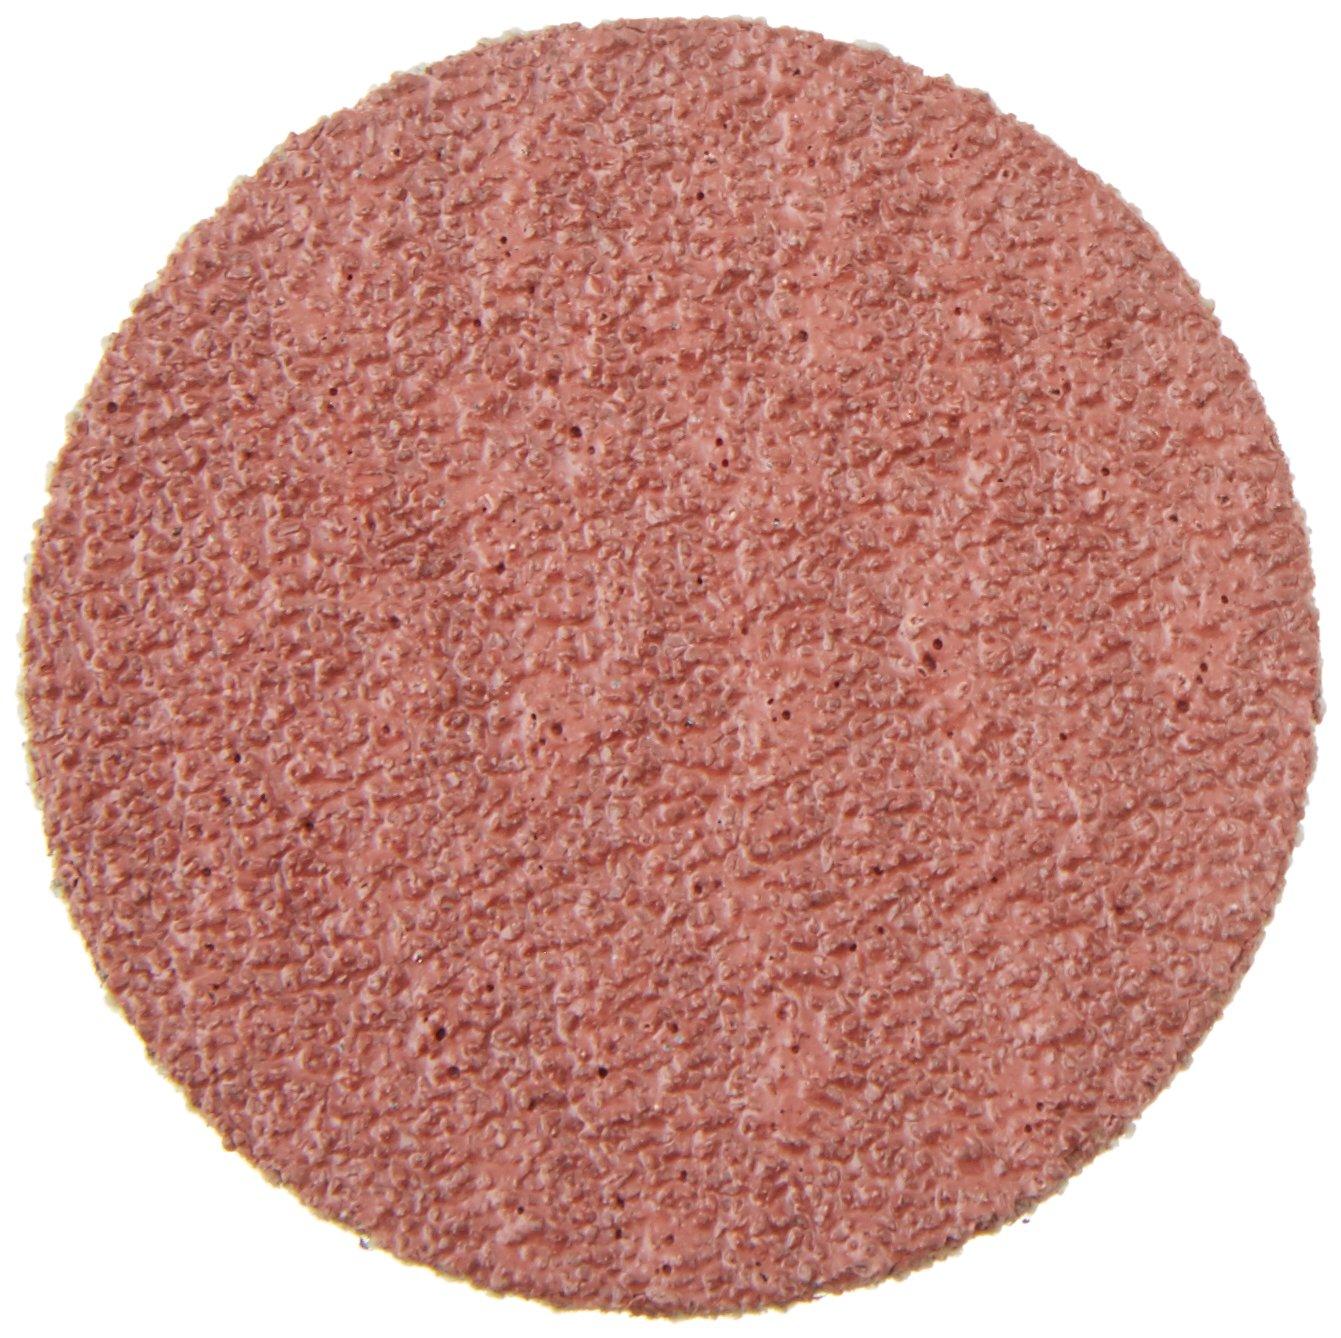 United Abrasives-SAIT 35108 24X 7-Inch Pressure Sensitive Adhesive Disc 25 Pack